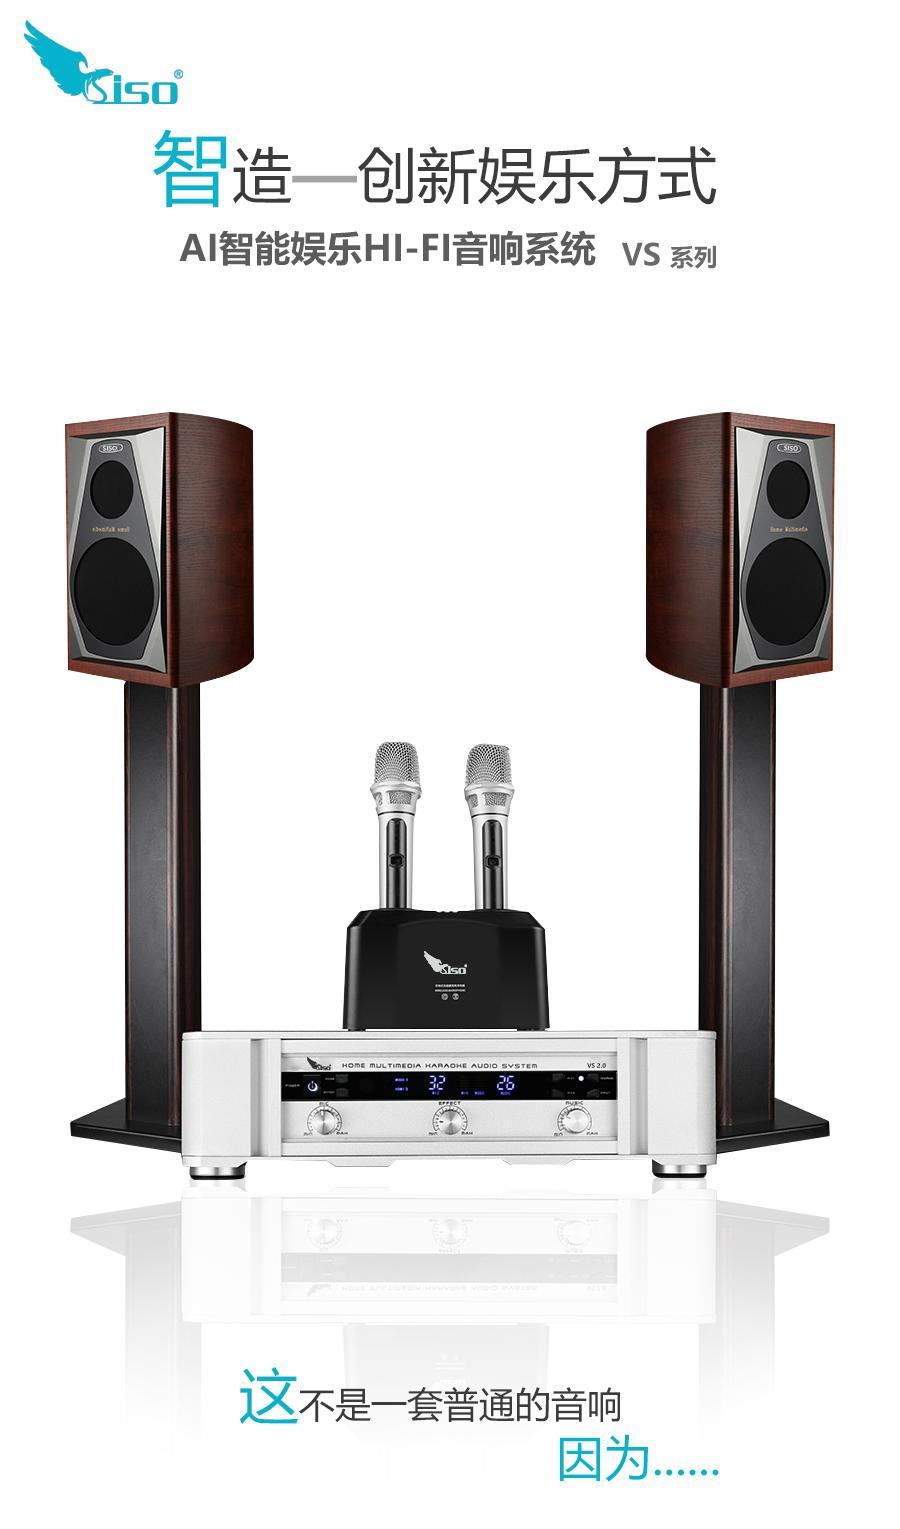 SISO音响家用KTV音箱专业功放唱歌点歌机家庭影院 1